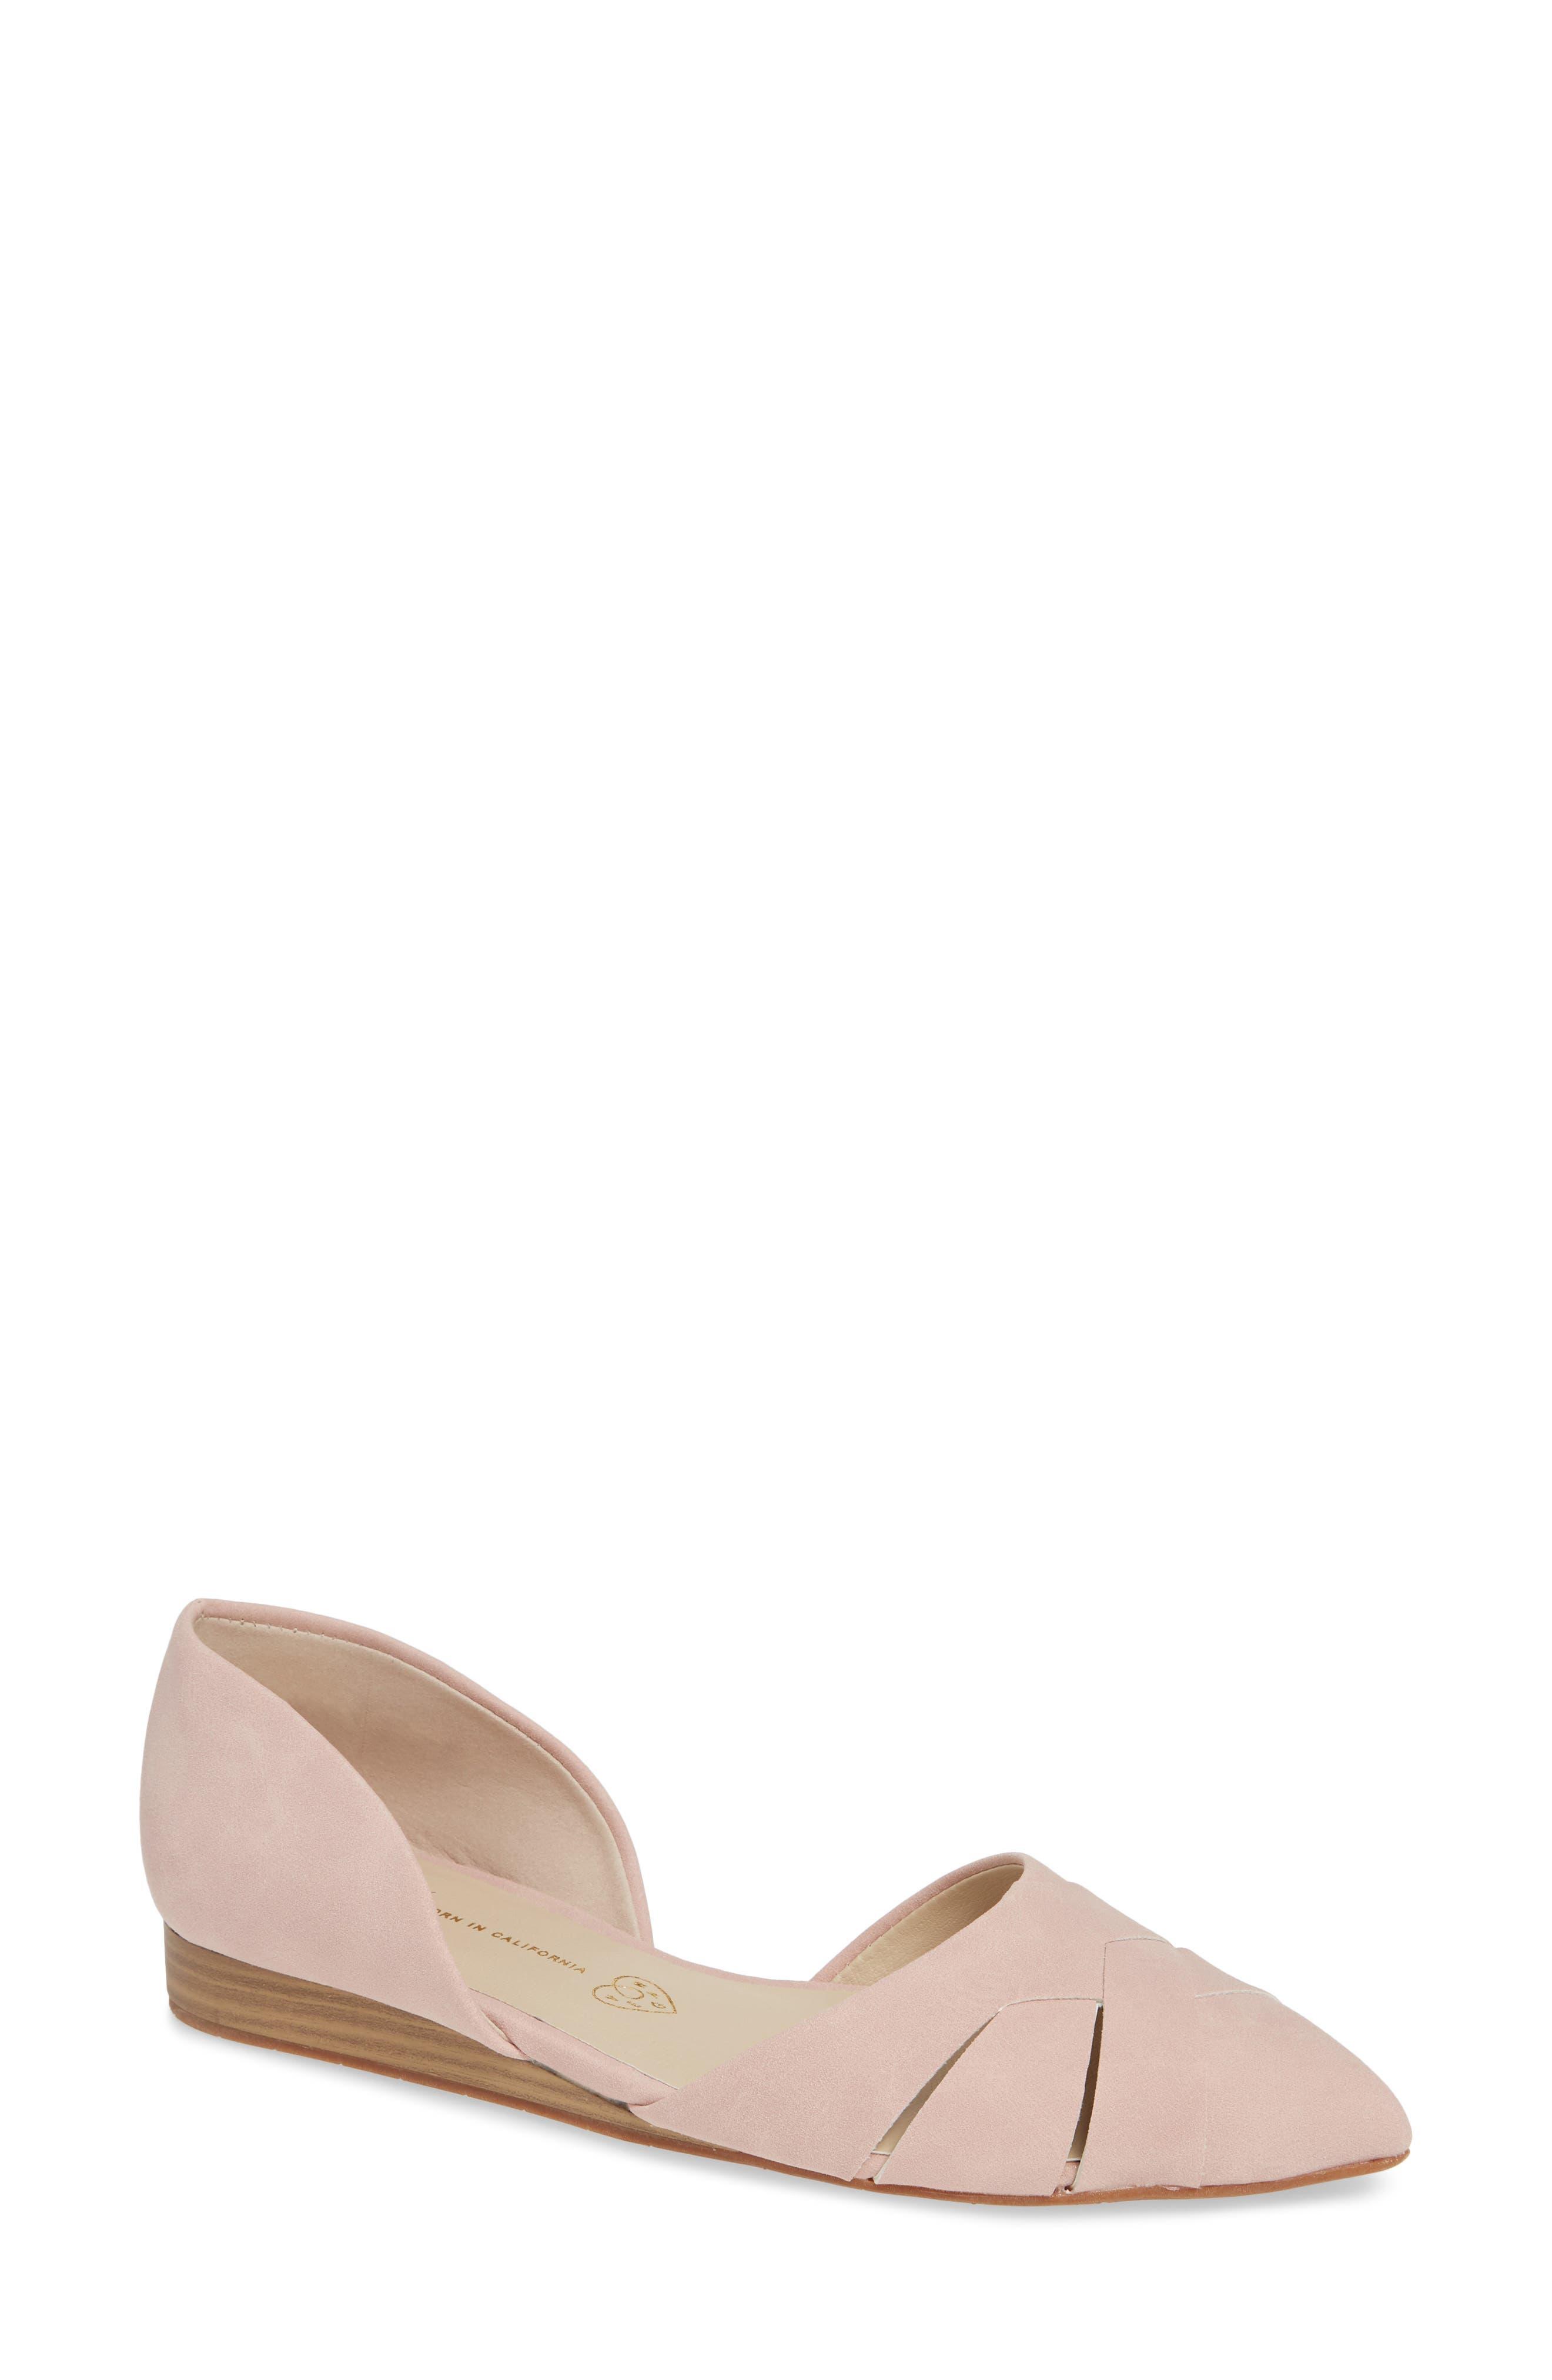 Bc Footwear Focal Point Vegan Pointy Toe Flat, Pink